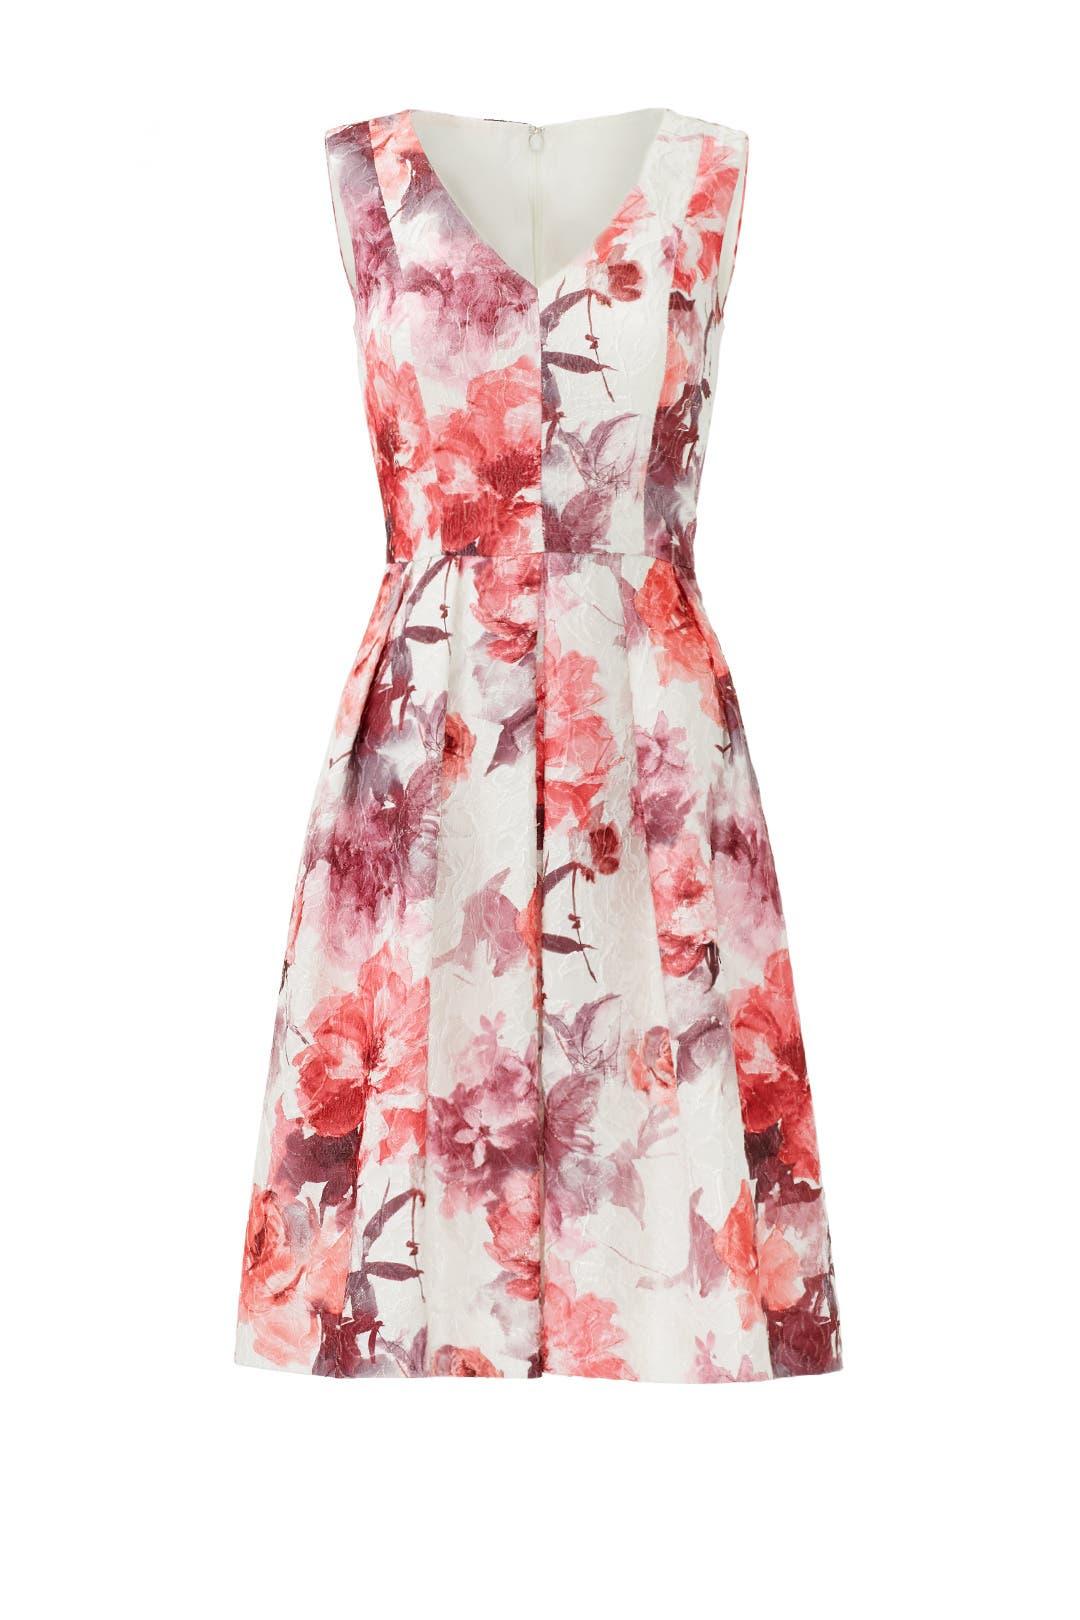 Plus-Size Dresses | Rent the Runway